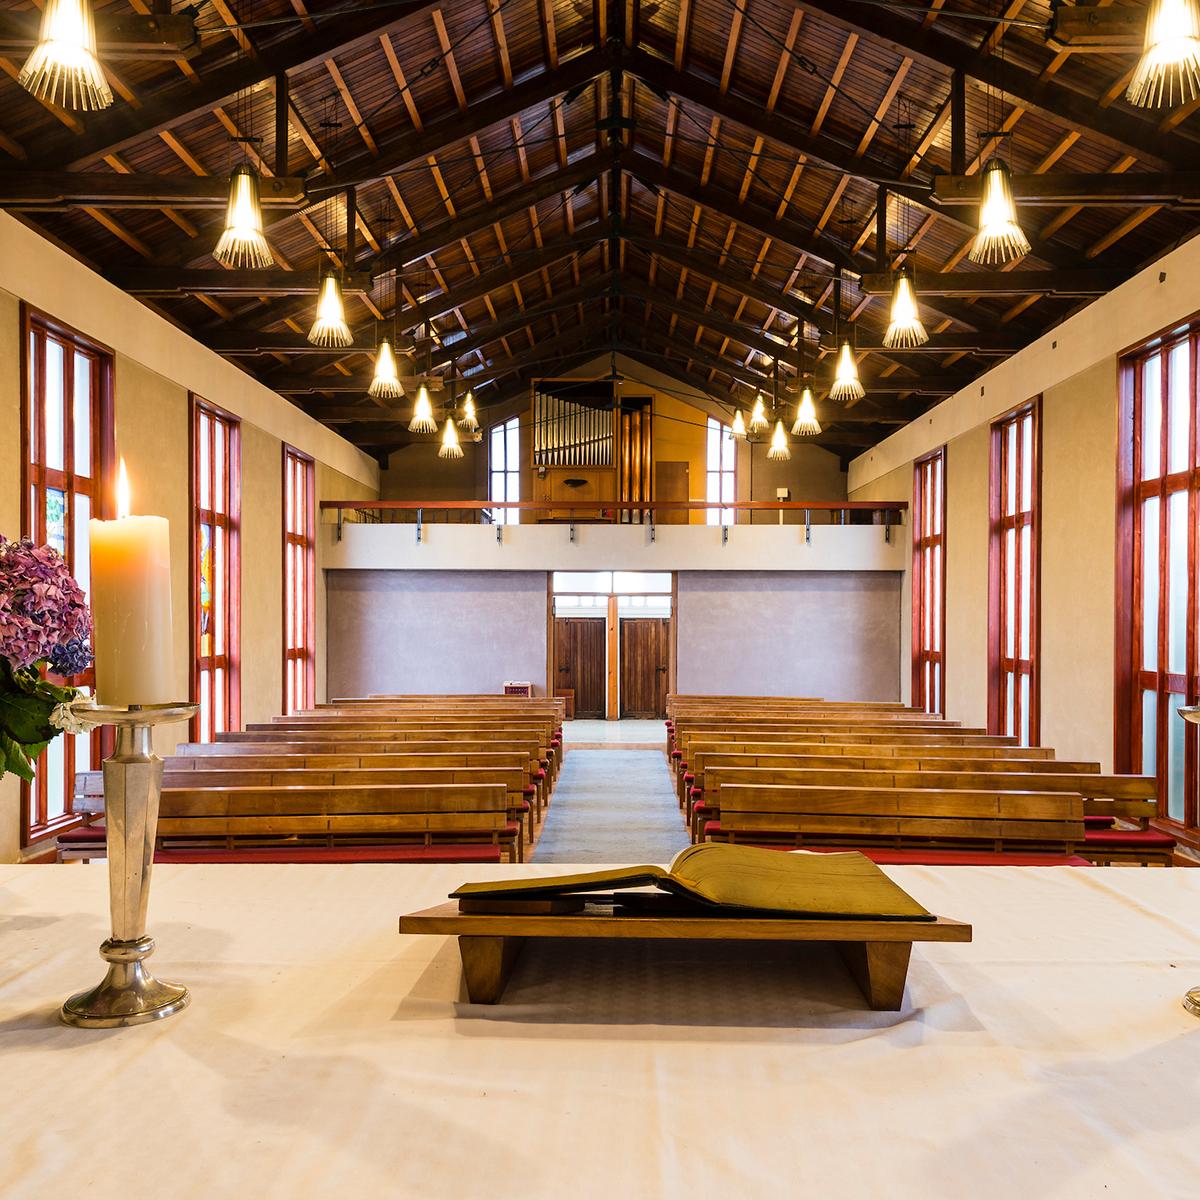 iglesia-luterana-en-puerto-montt